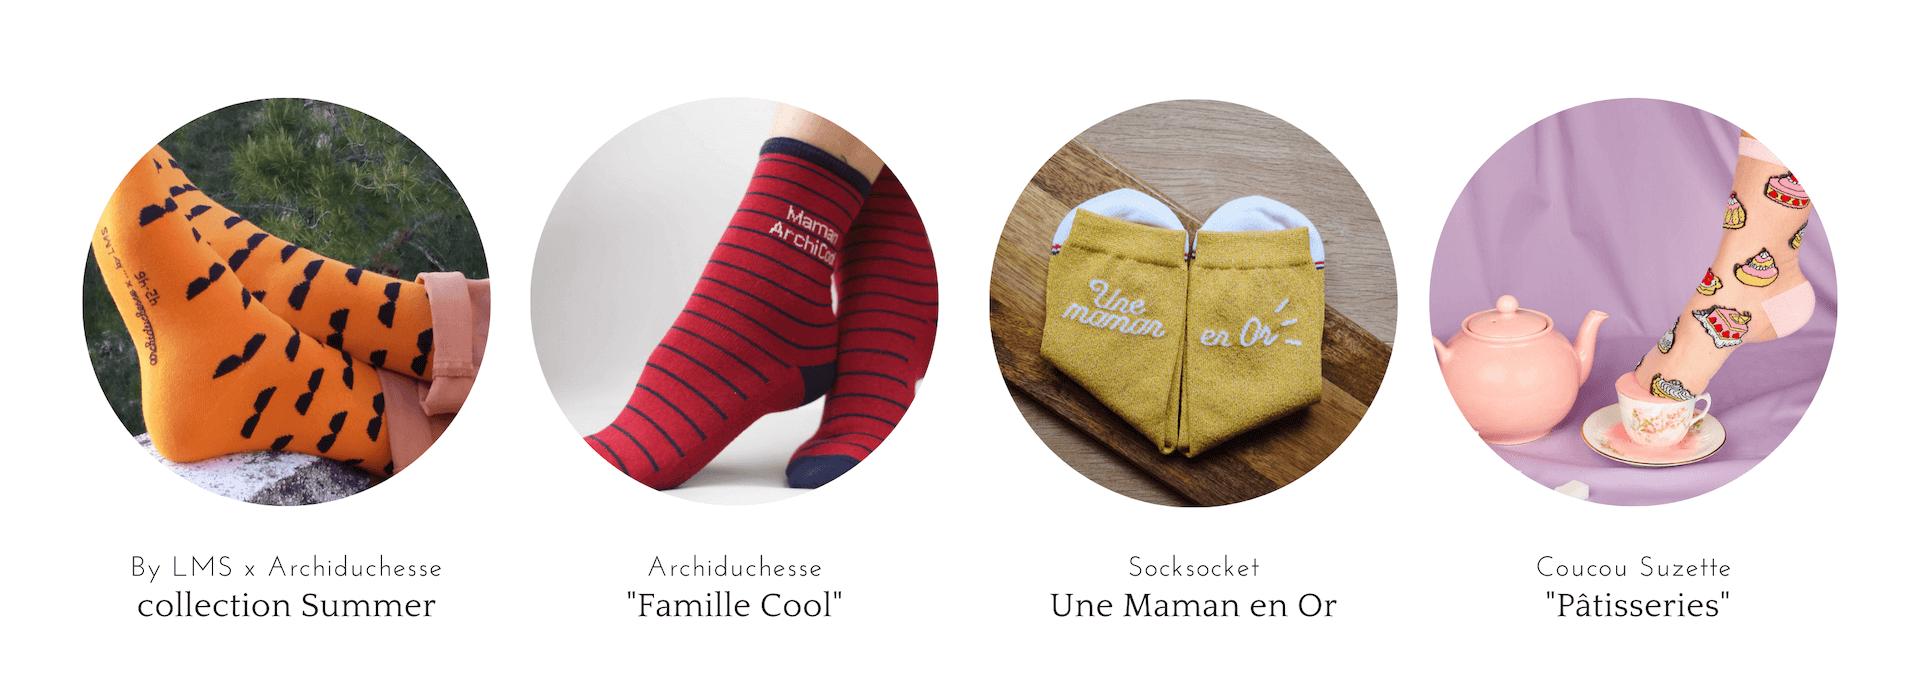 chaussettes-originales-bylms%20(1).png